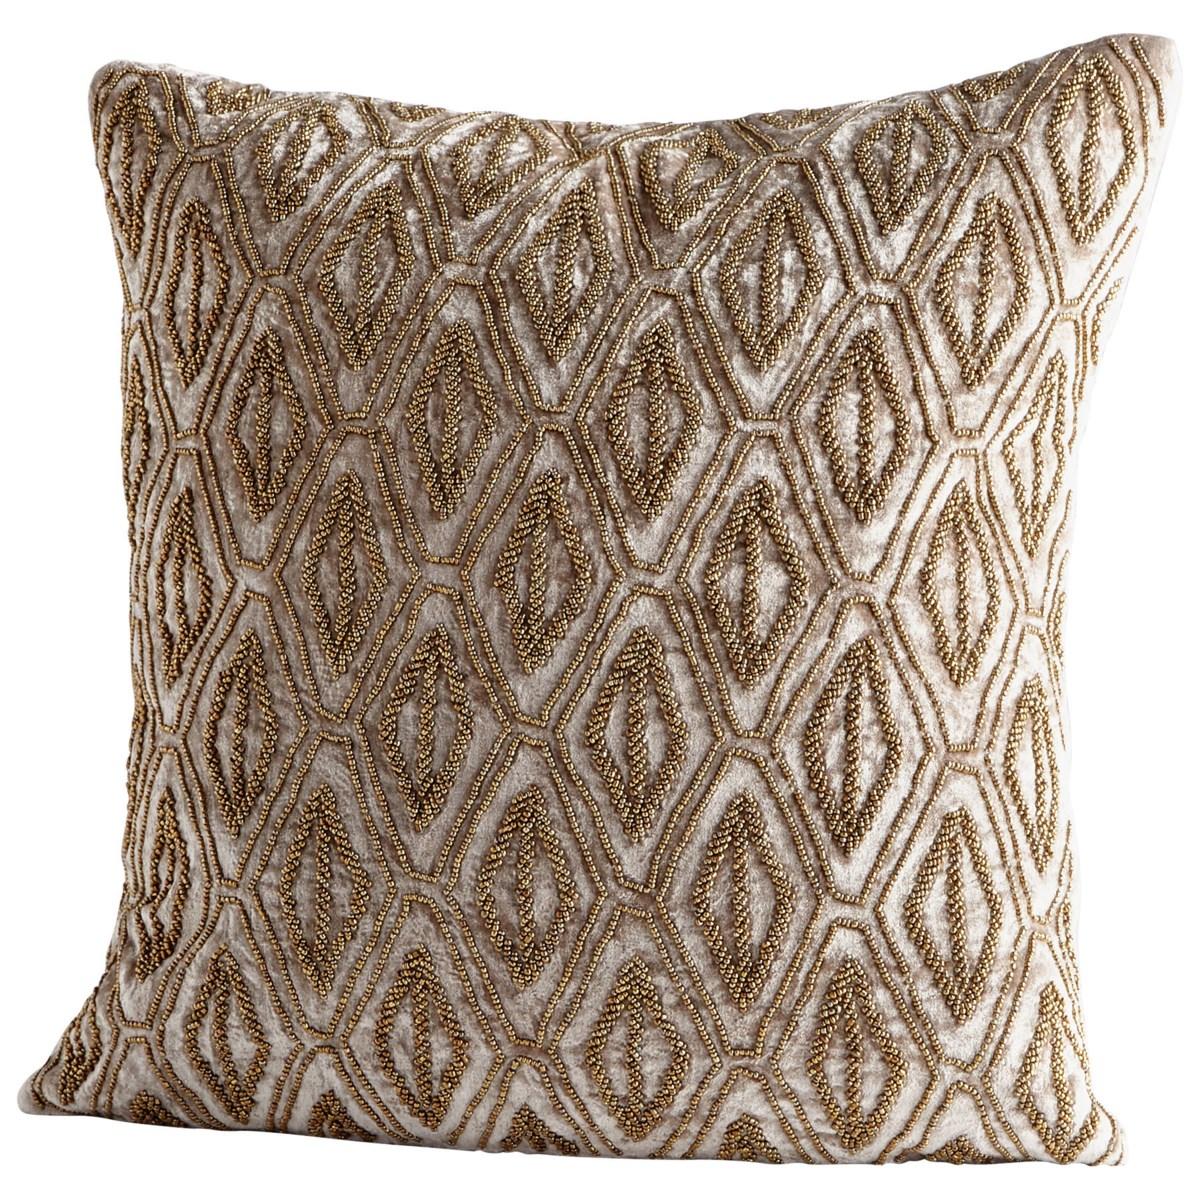 Honeycomb Pillow 18 x 18